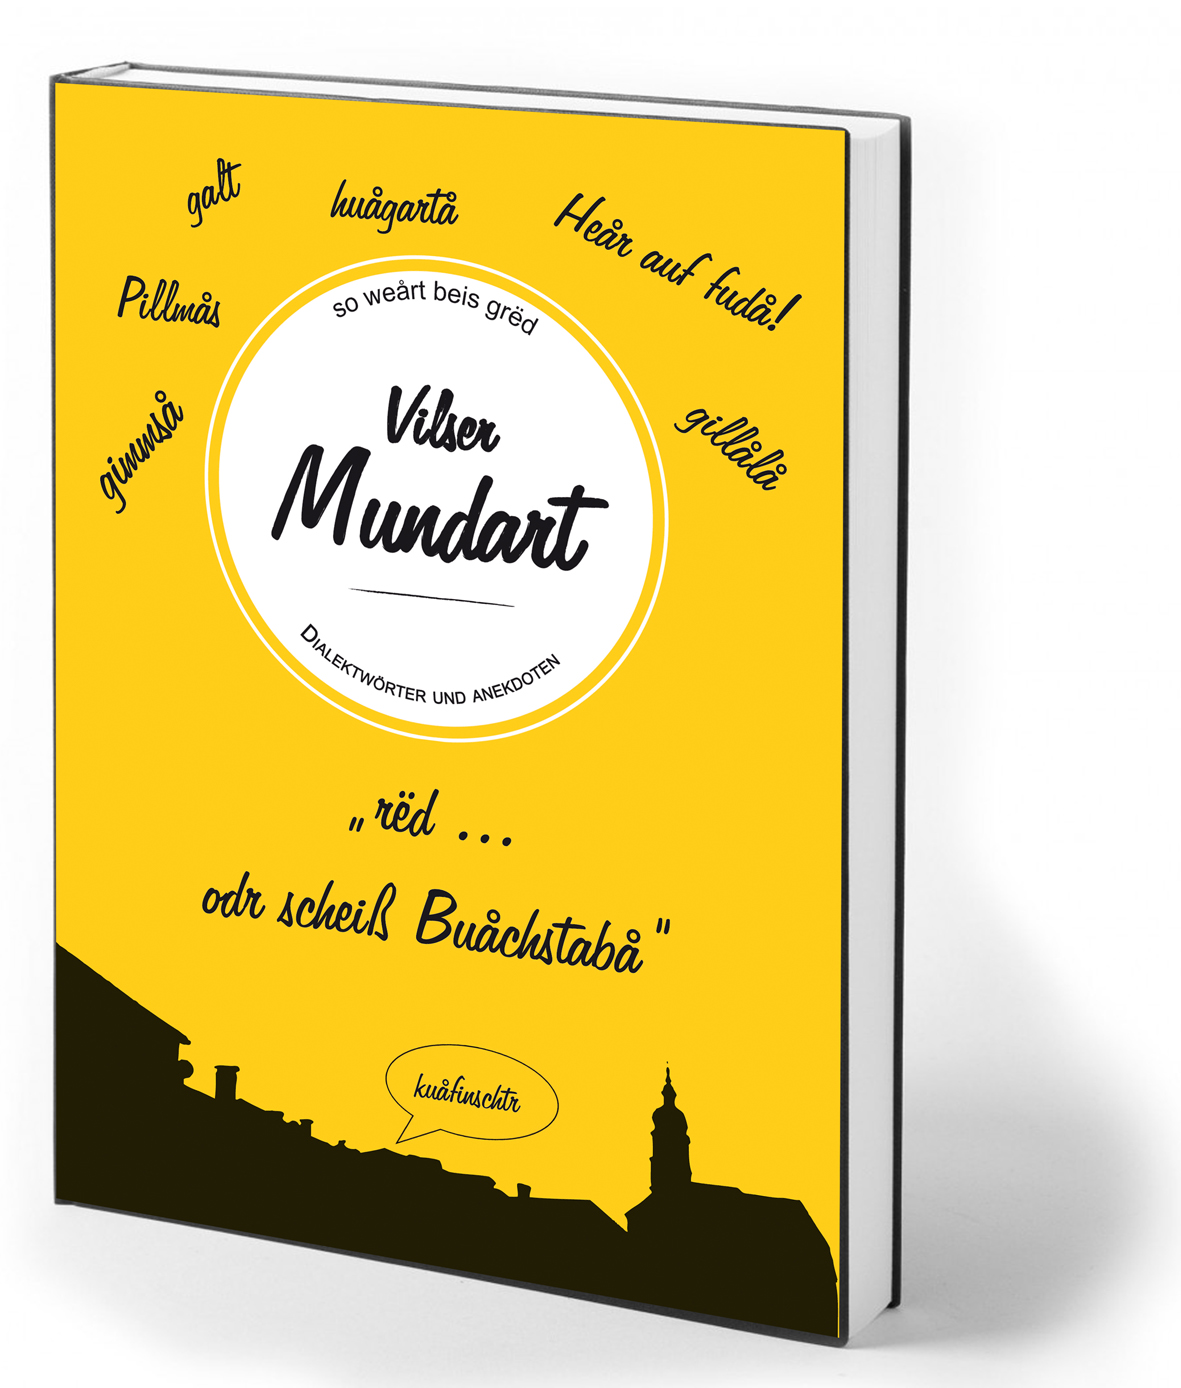 Vilser Mundart Buch